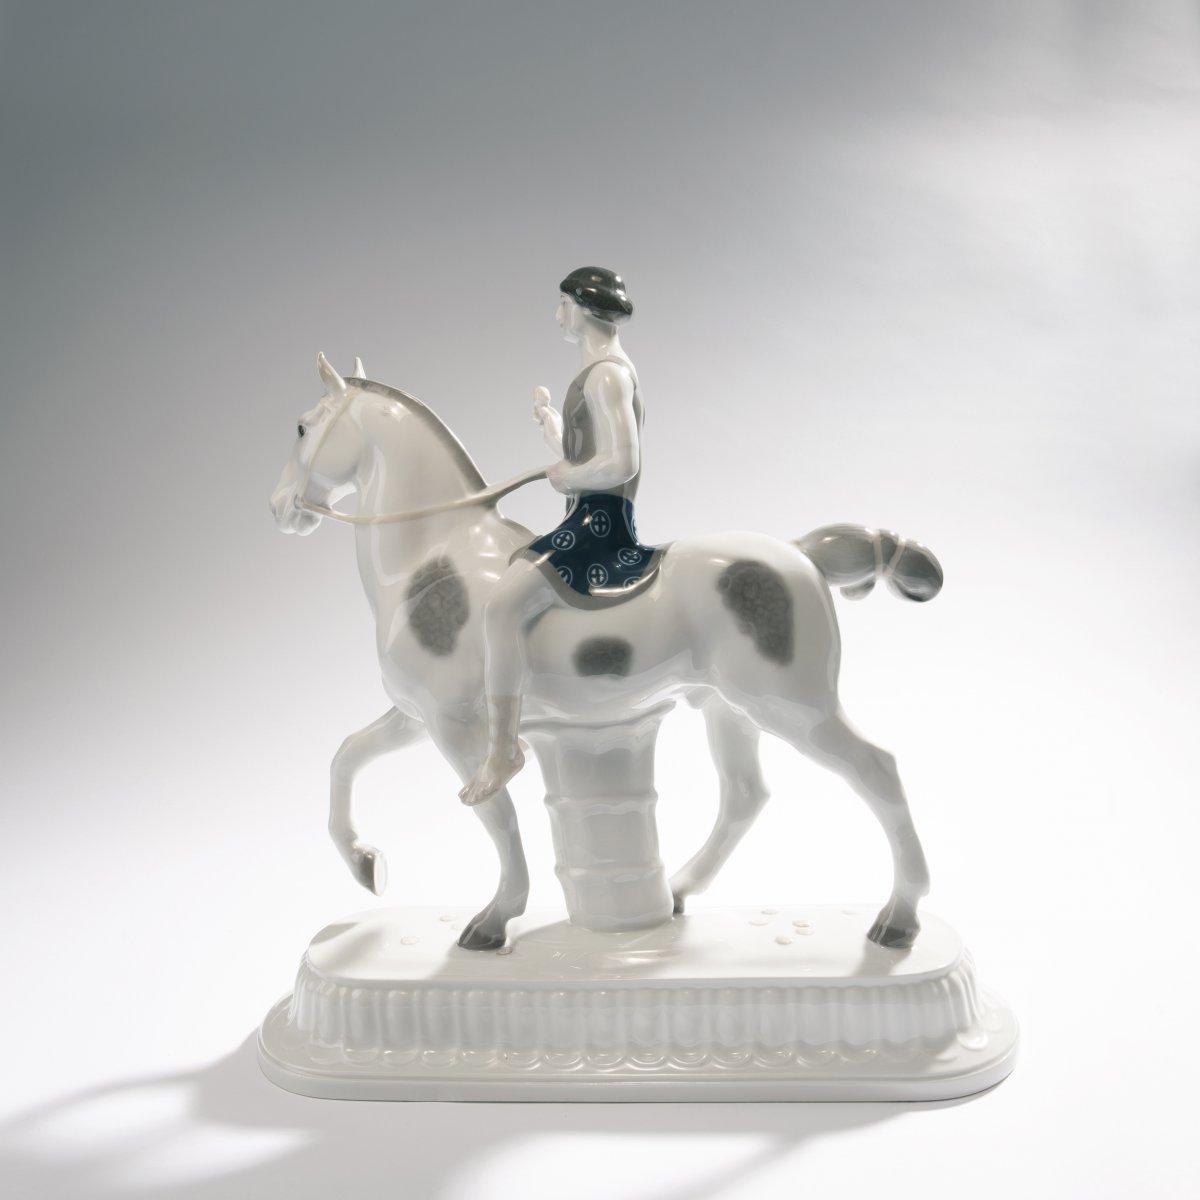 Lot 41 - Adolph Amberg, 'Bridegroom', 1910'Bridegroom', 1910H. 40.5 cm, 42 x 13.3 cm. Made by KPM Berlin,